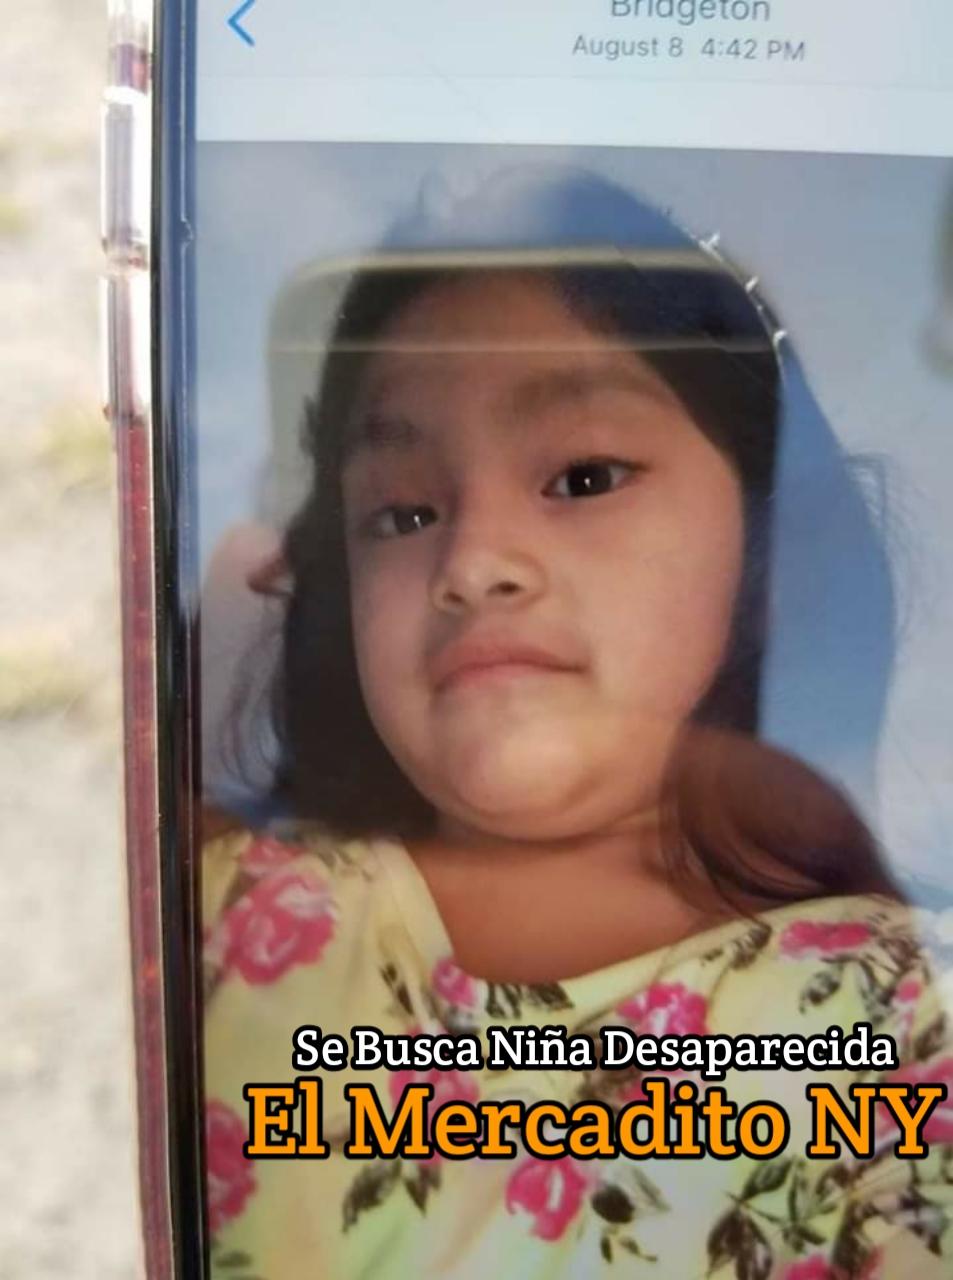 Ayuda a Encontrar Niñita Desaparecida 20190916